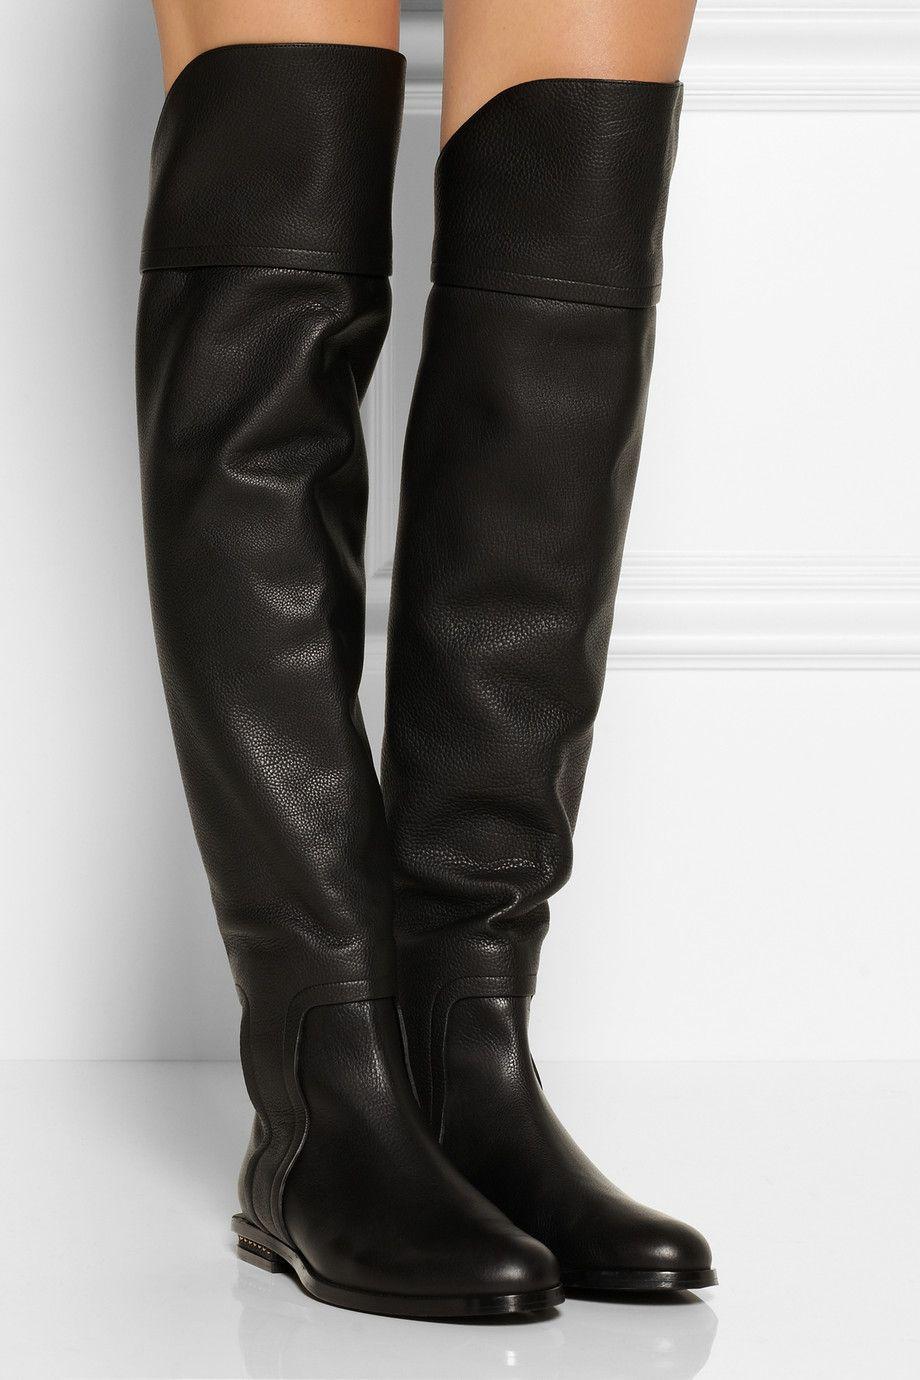 dcc749ebb9e6 Black Leather Vogue Designer Flat Knee High Boots